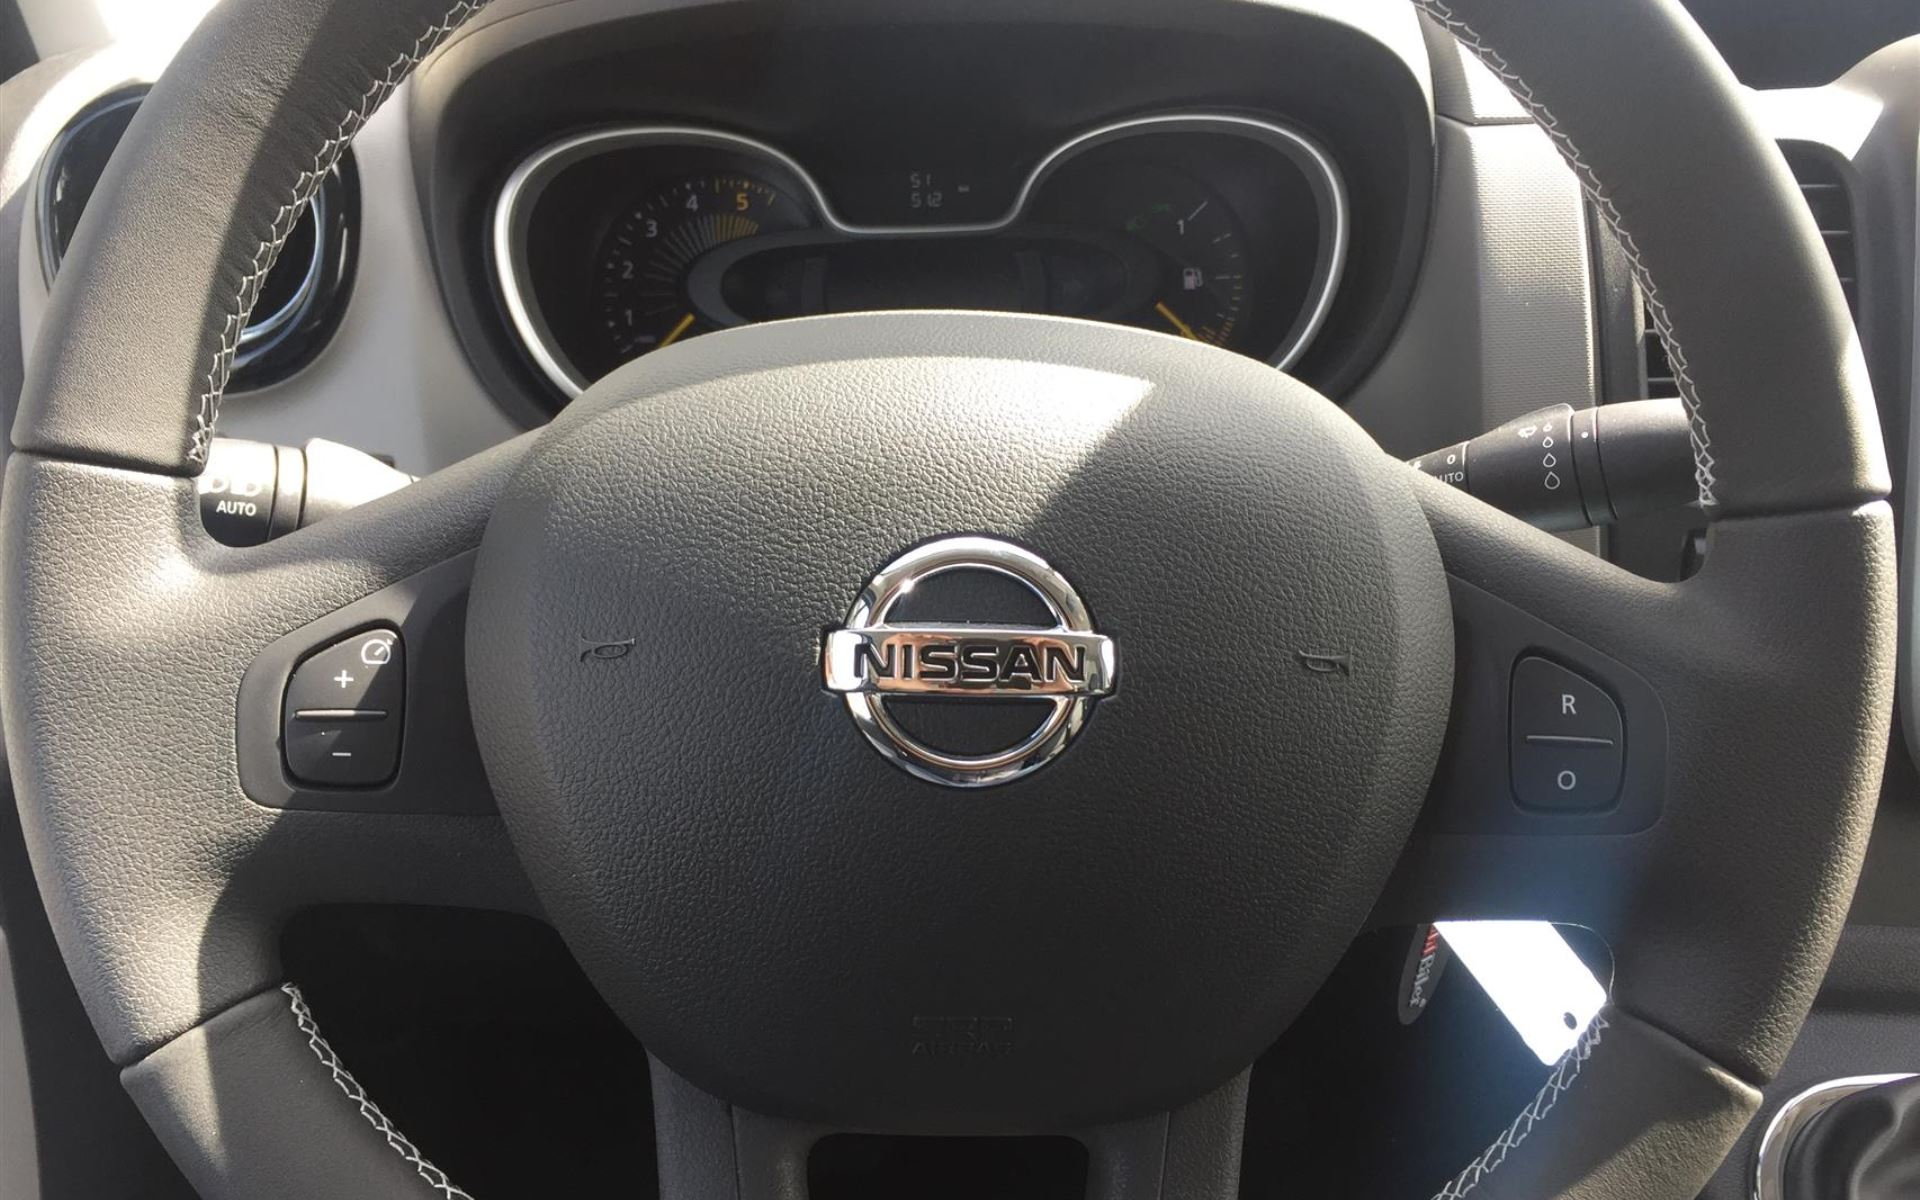 Nissan NV 300